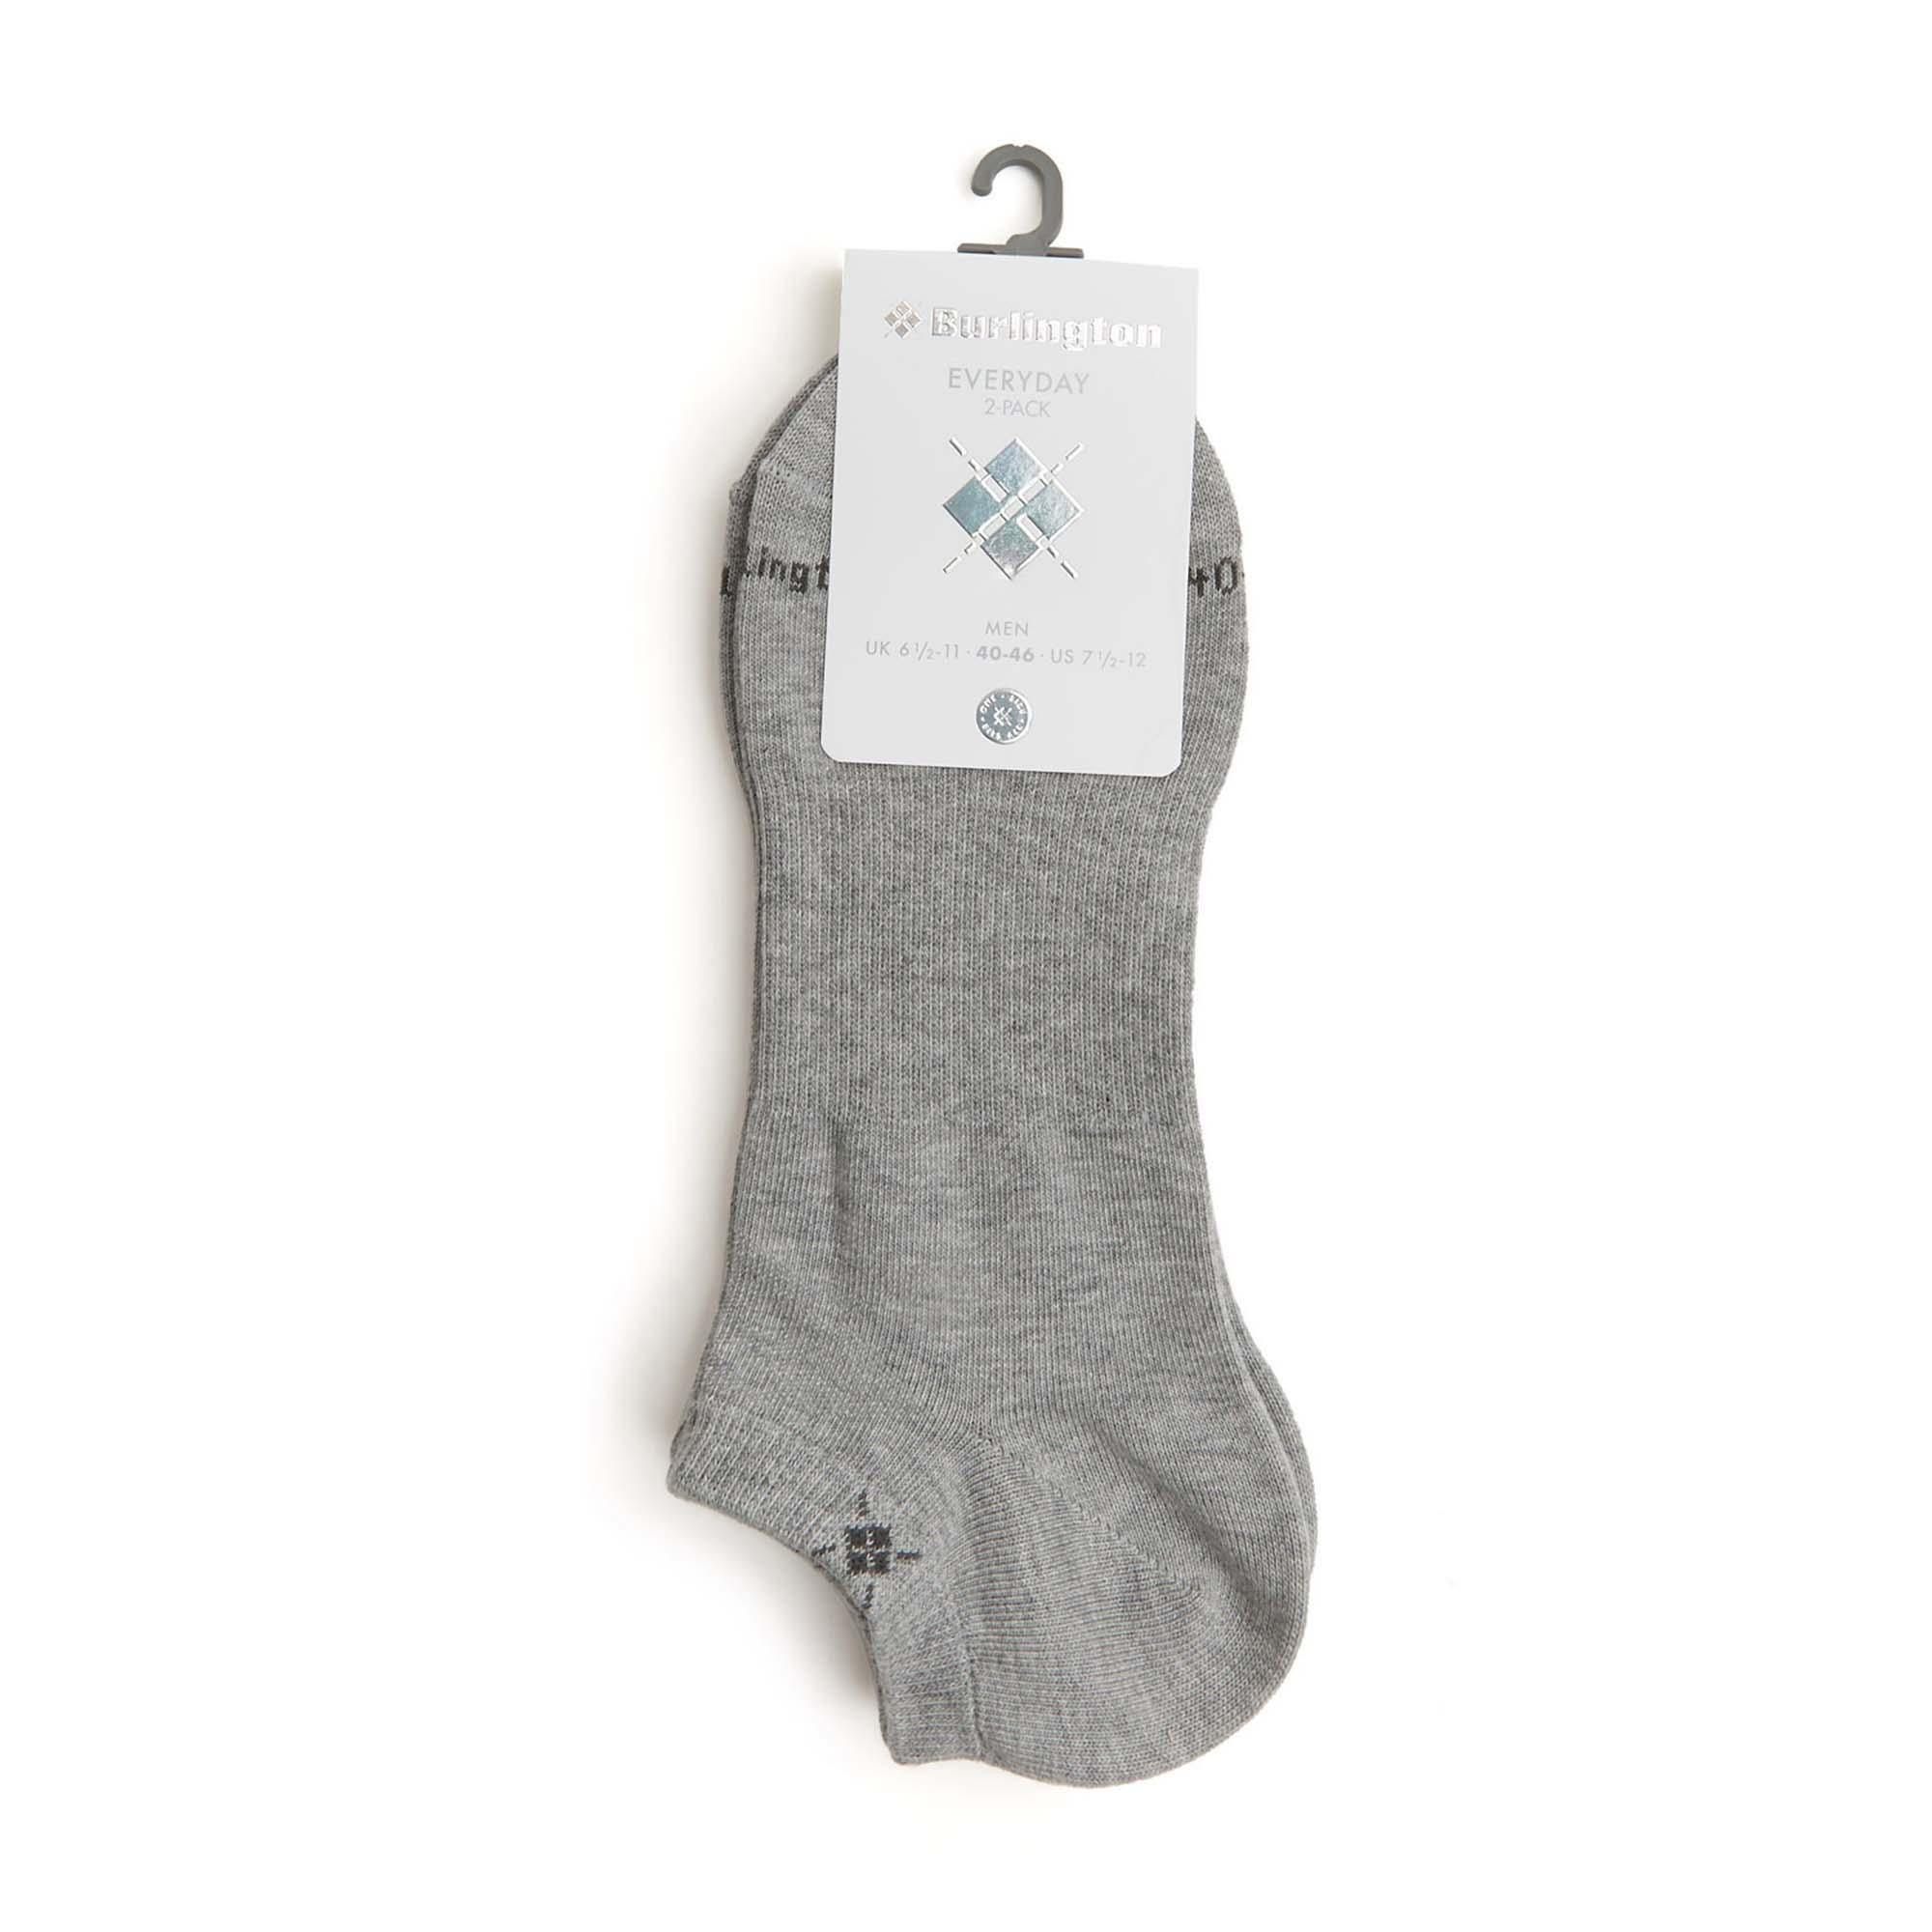 Everyday sneaker socks